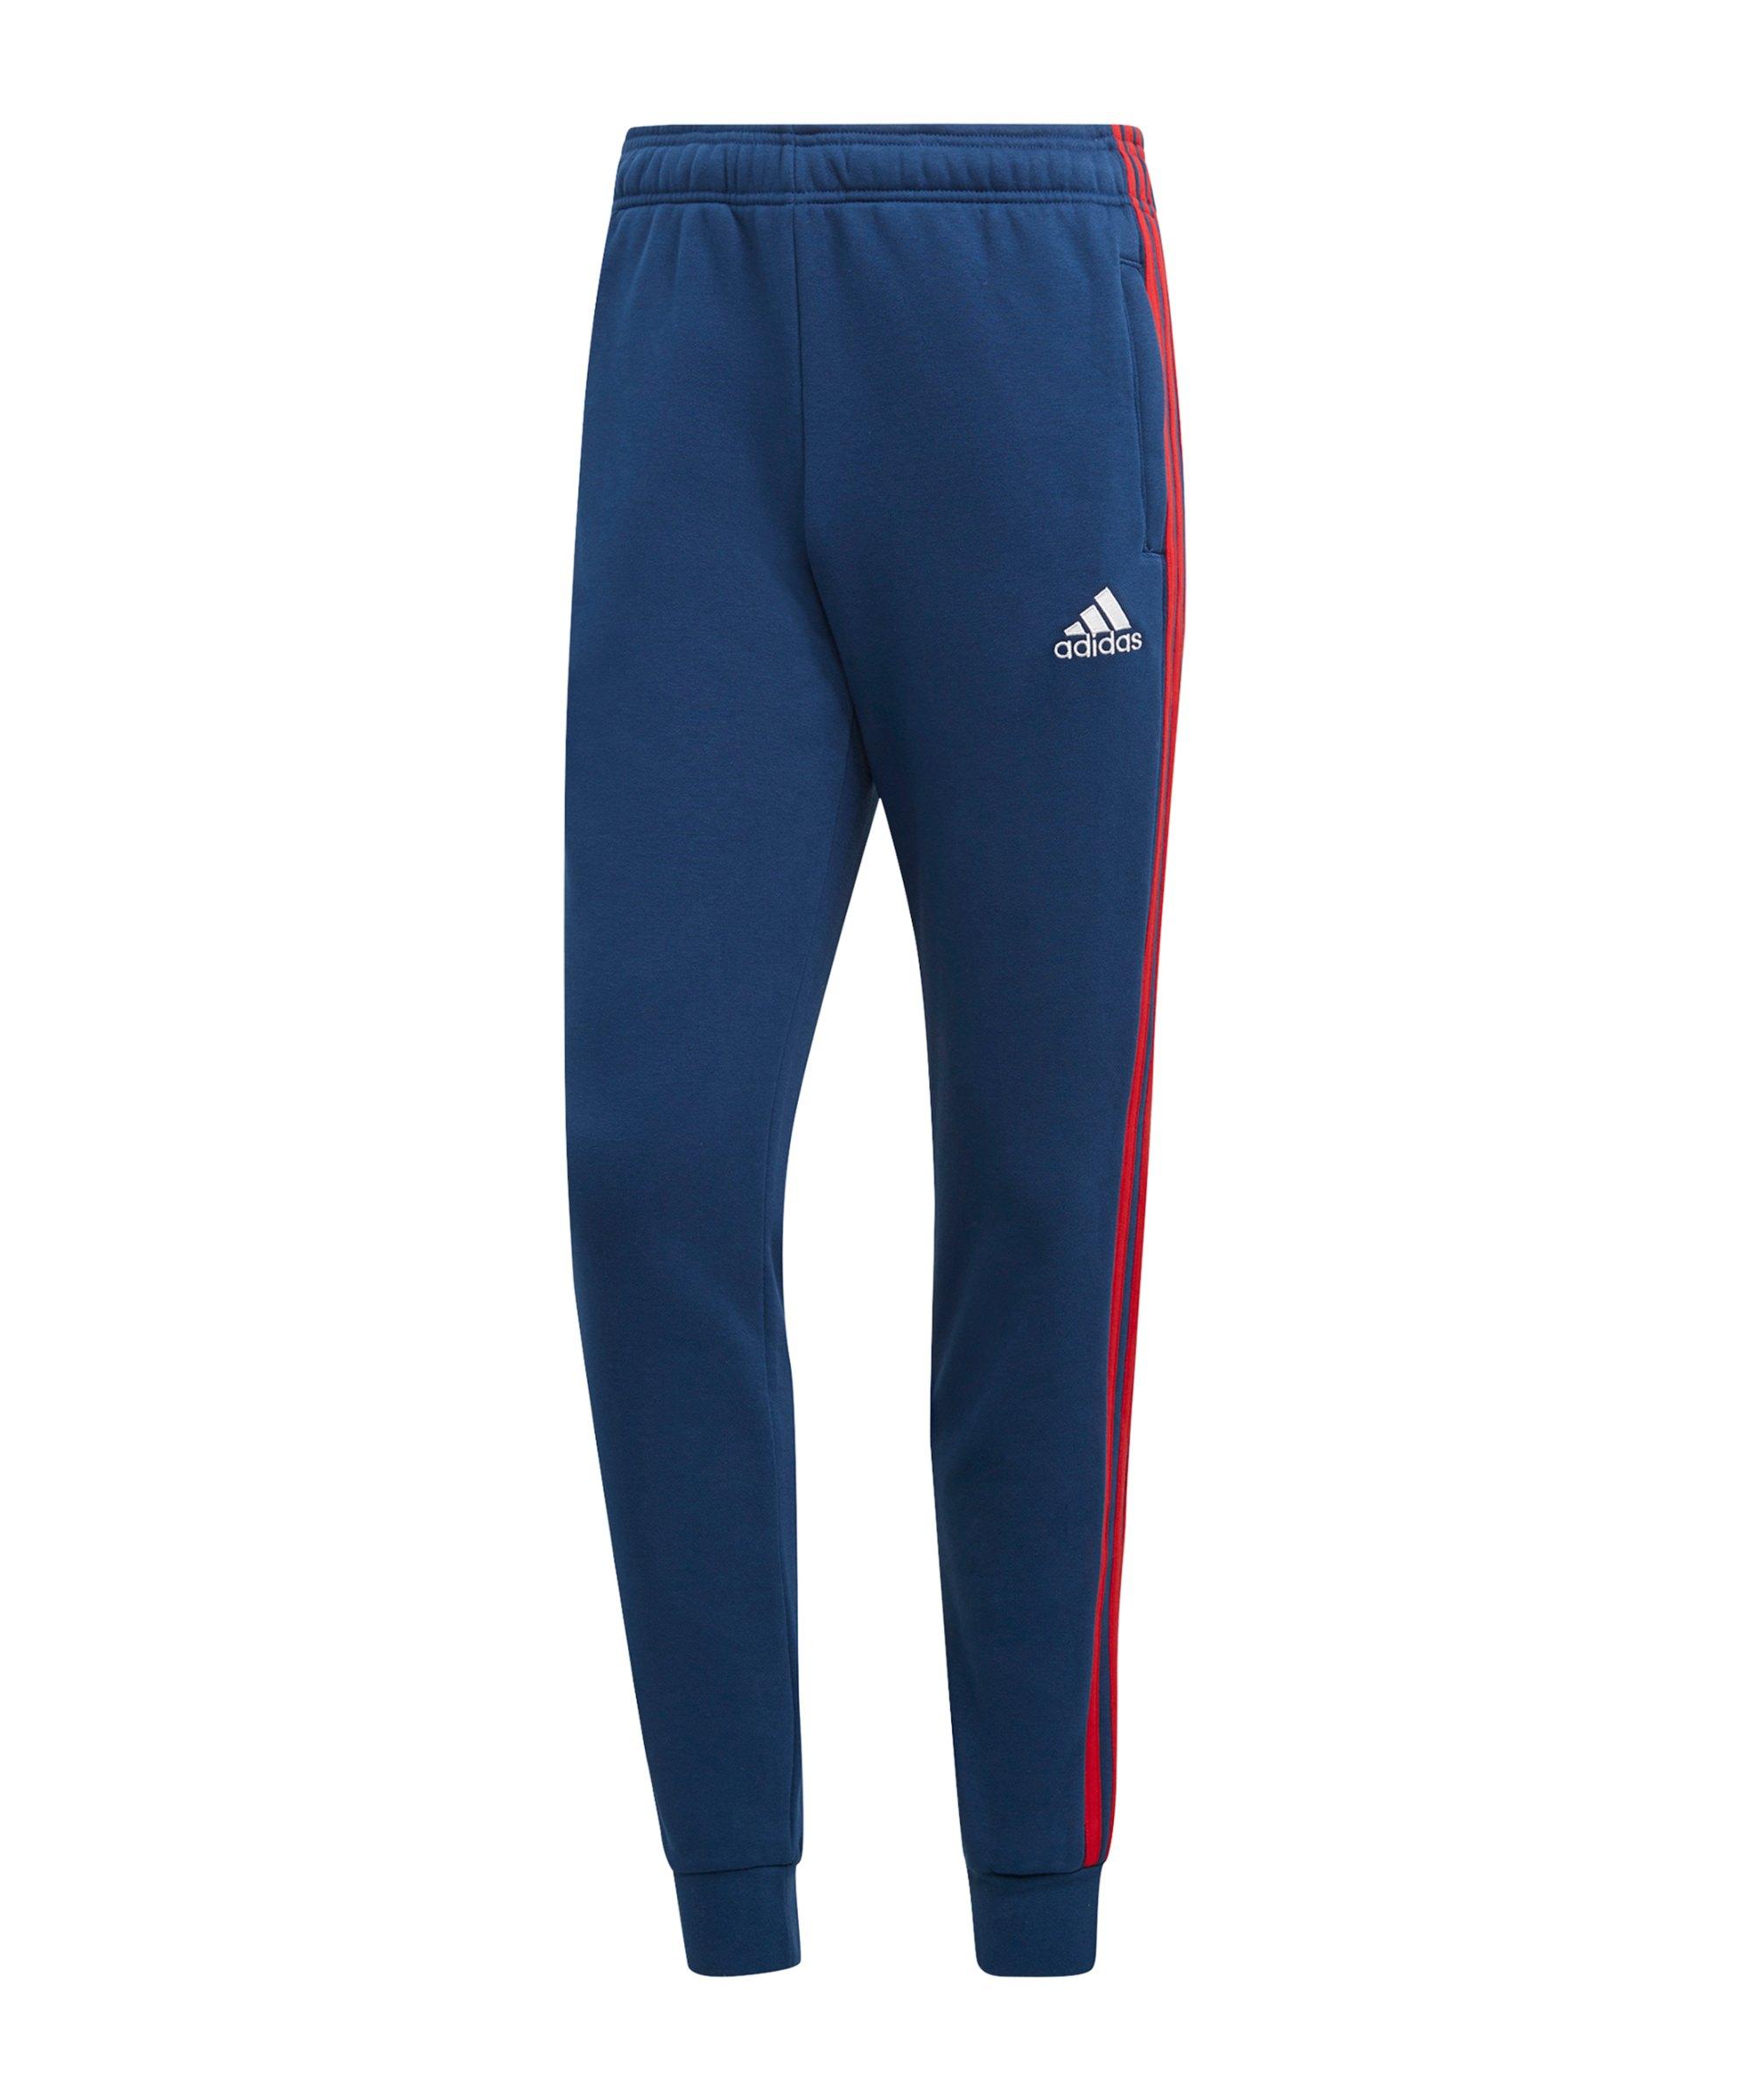 adidas FC Arsenal London 3S Jogginghose Blau - blau